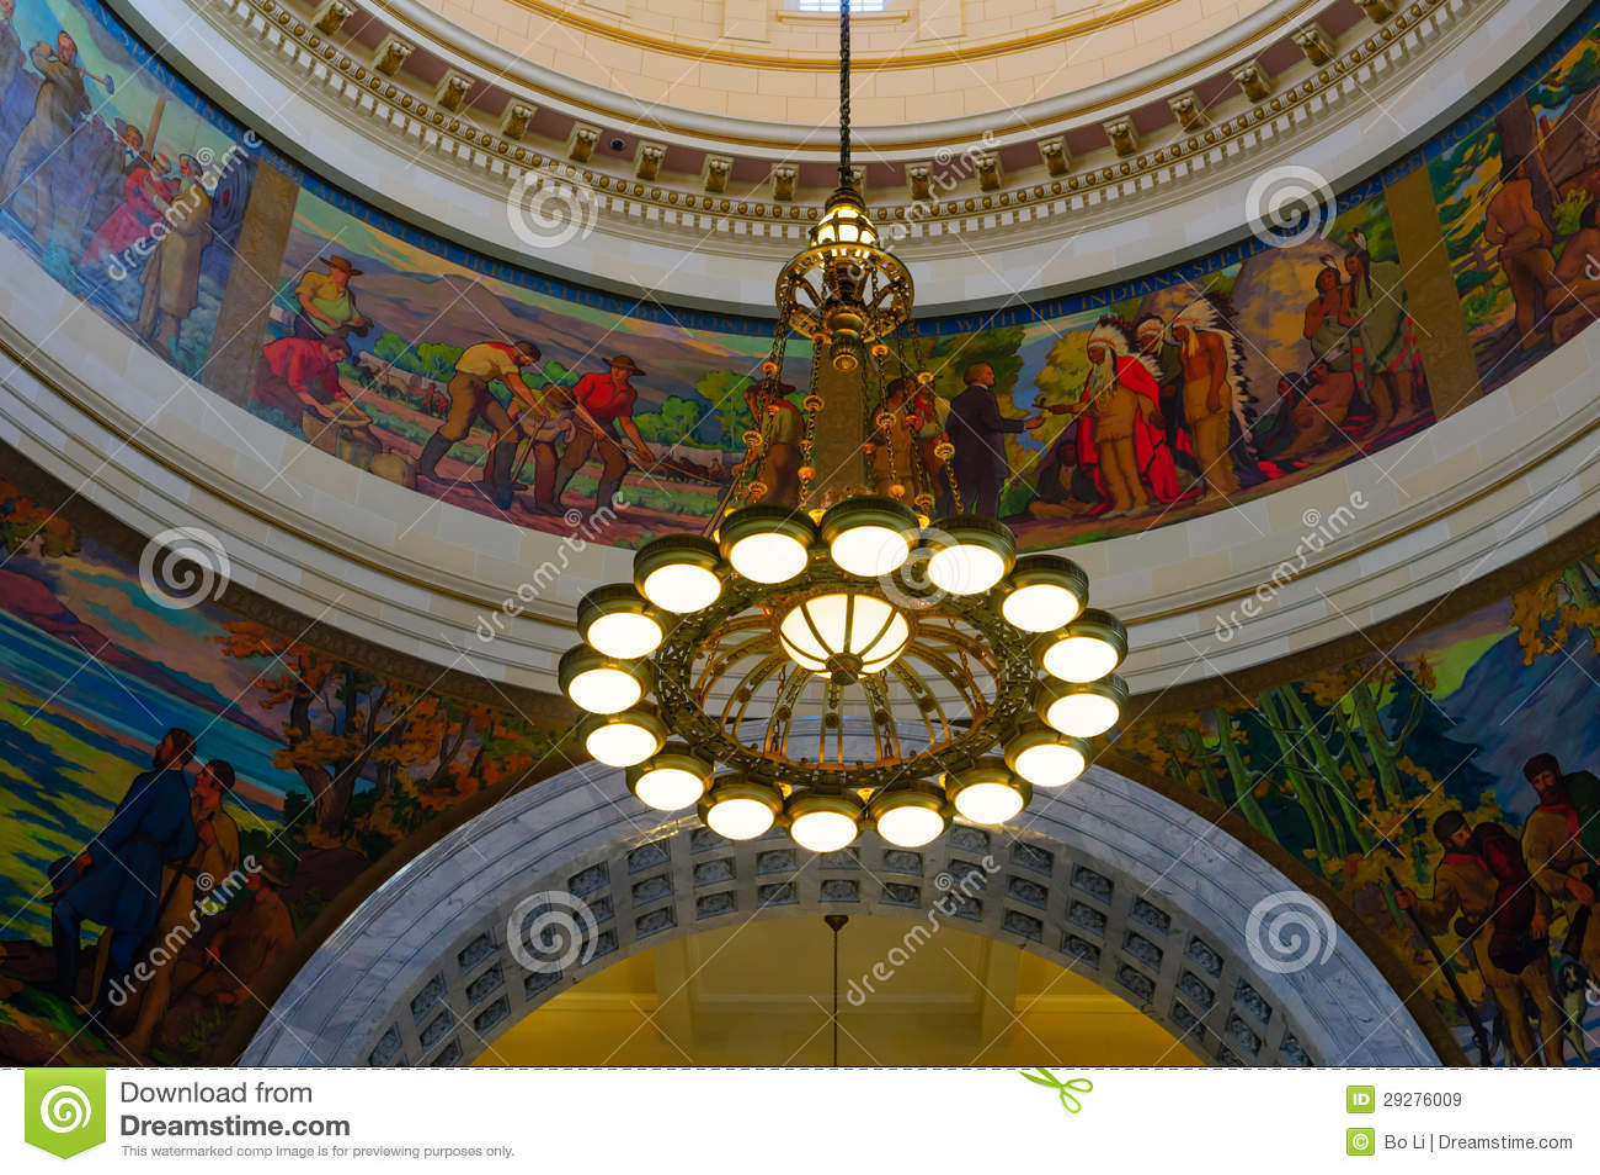 The lights in Utah State Capitol rotunda